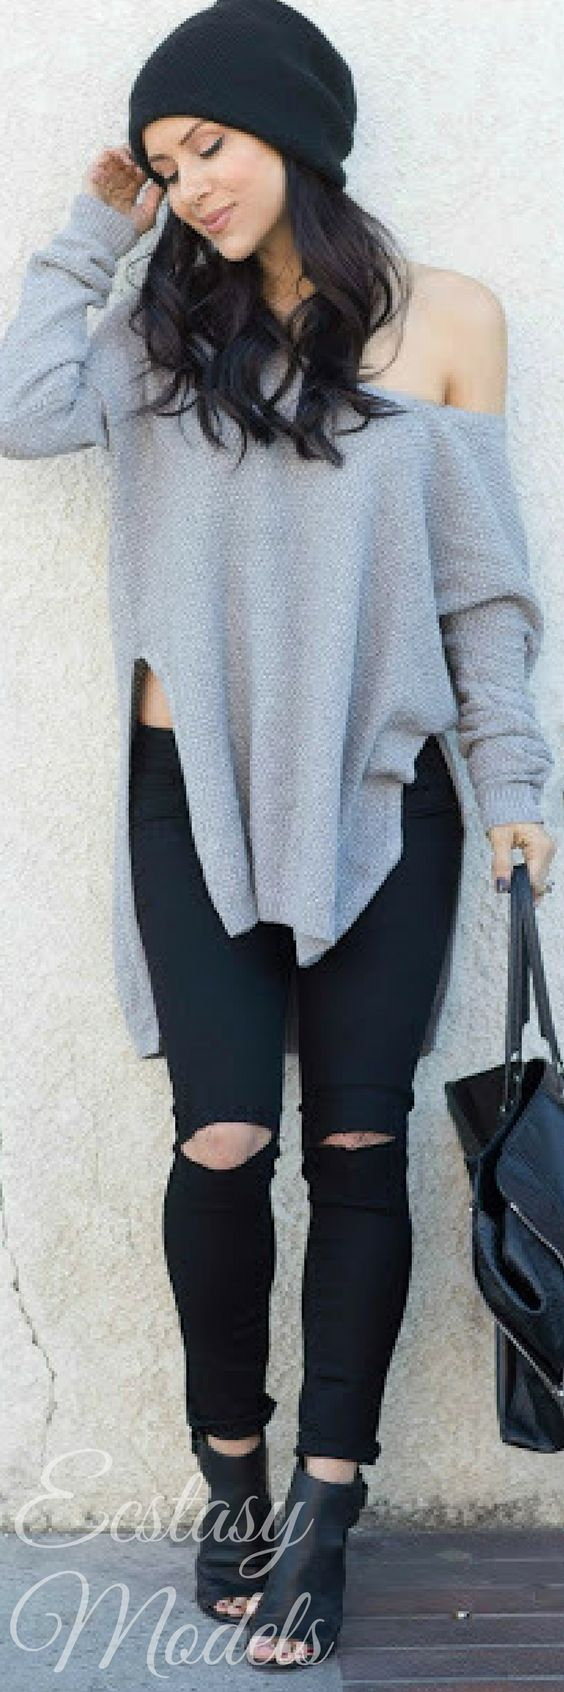 DISTRESSED DENIM // Fashion By Andee Layne